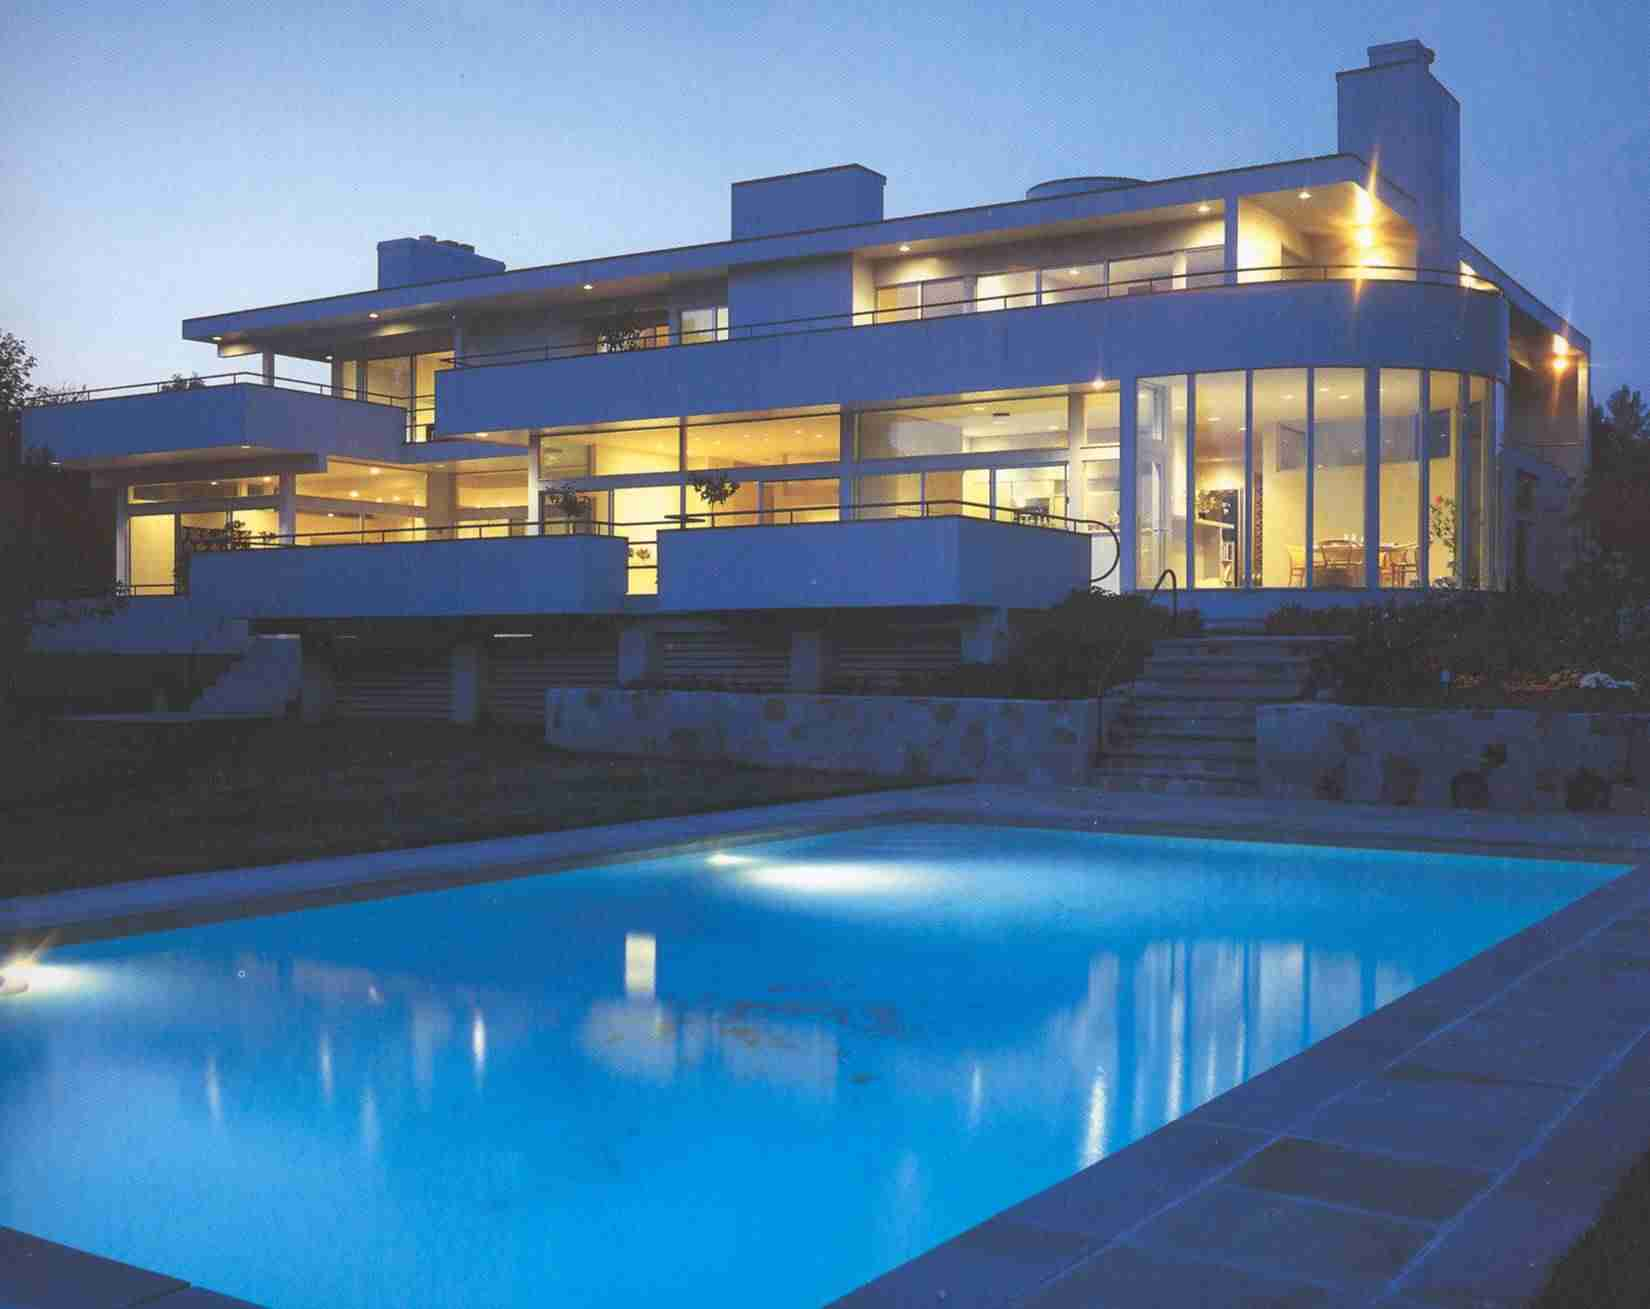 Vuko Tashkovich Architecture, Private Pound Ridge, NY Residence